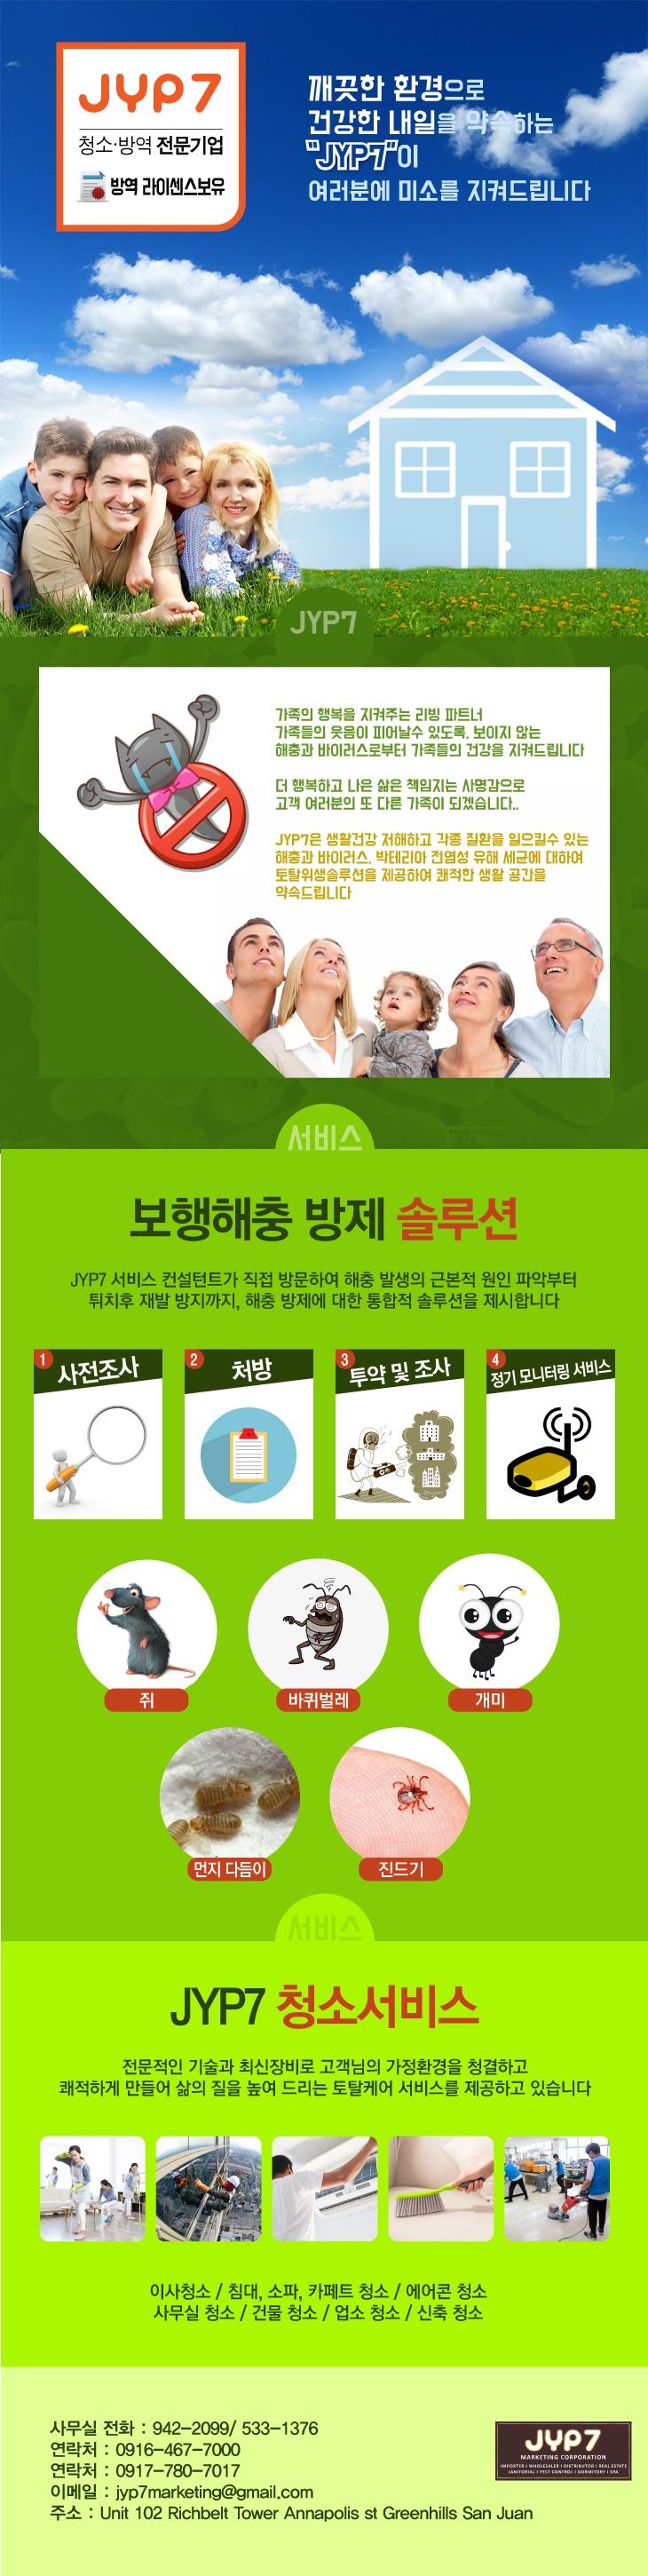 JYP7.jpg